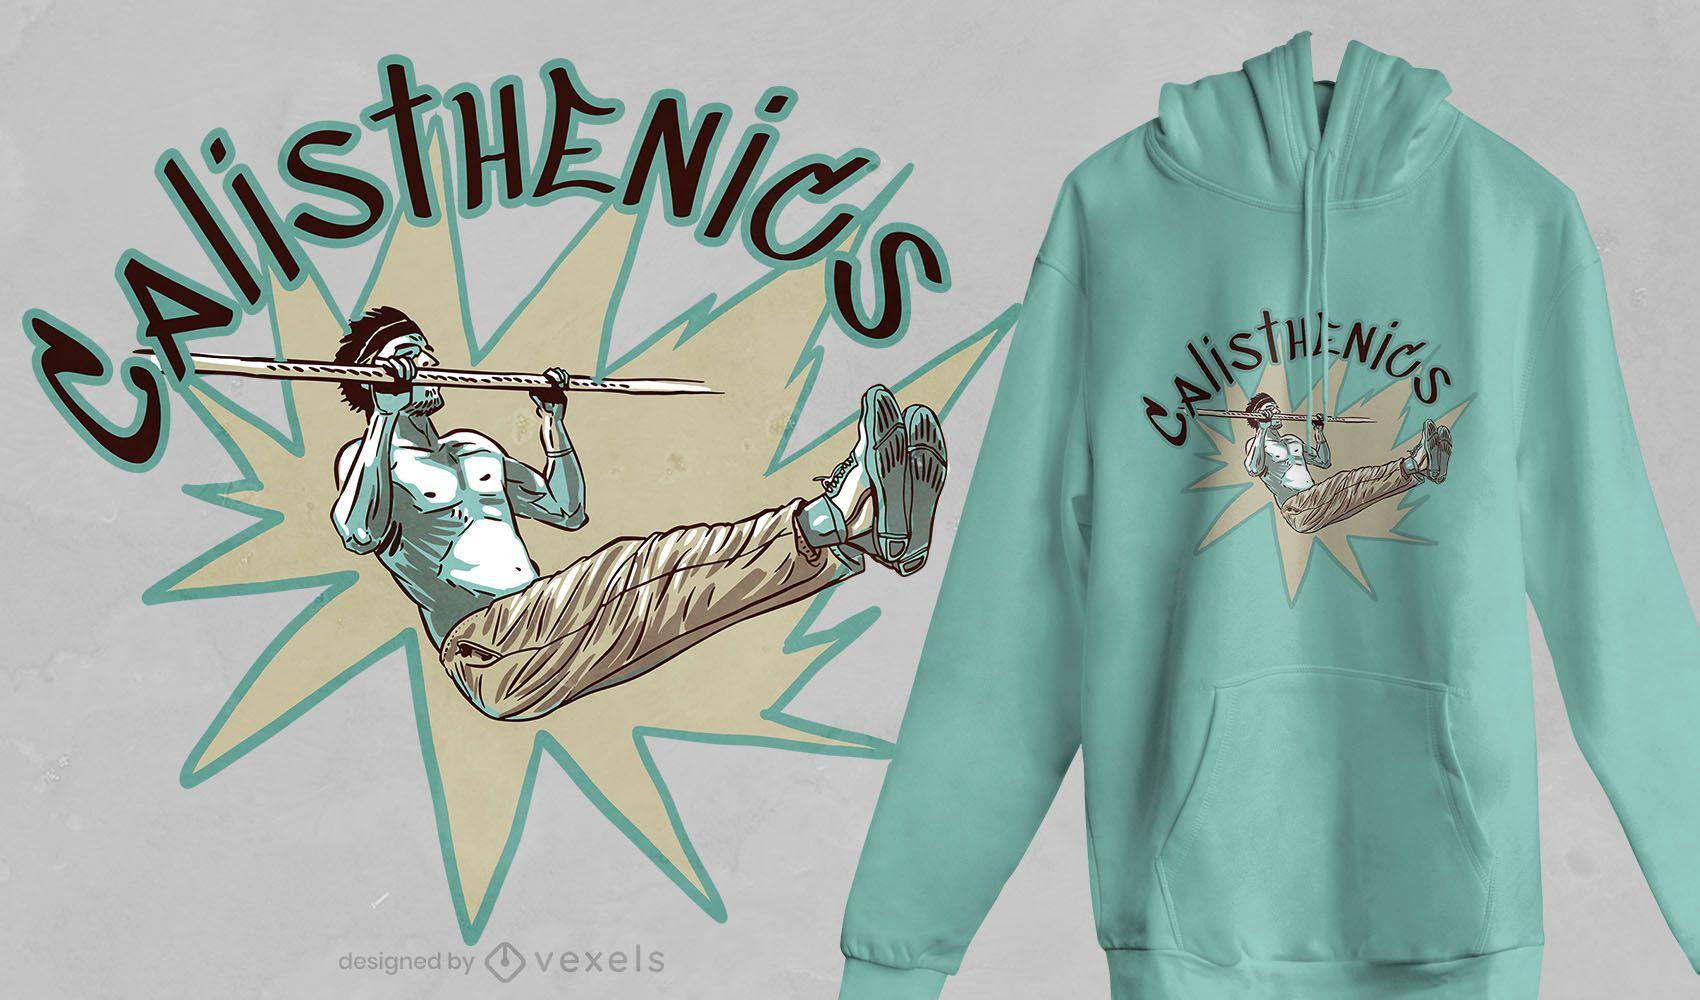 Calisthenics man t-shirt design